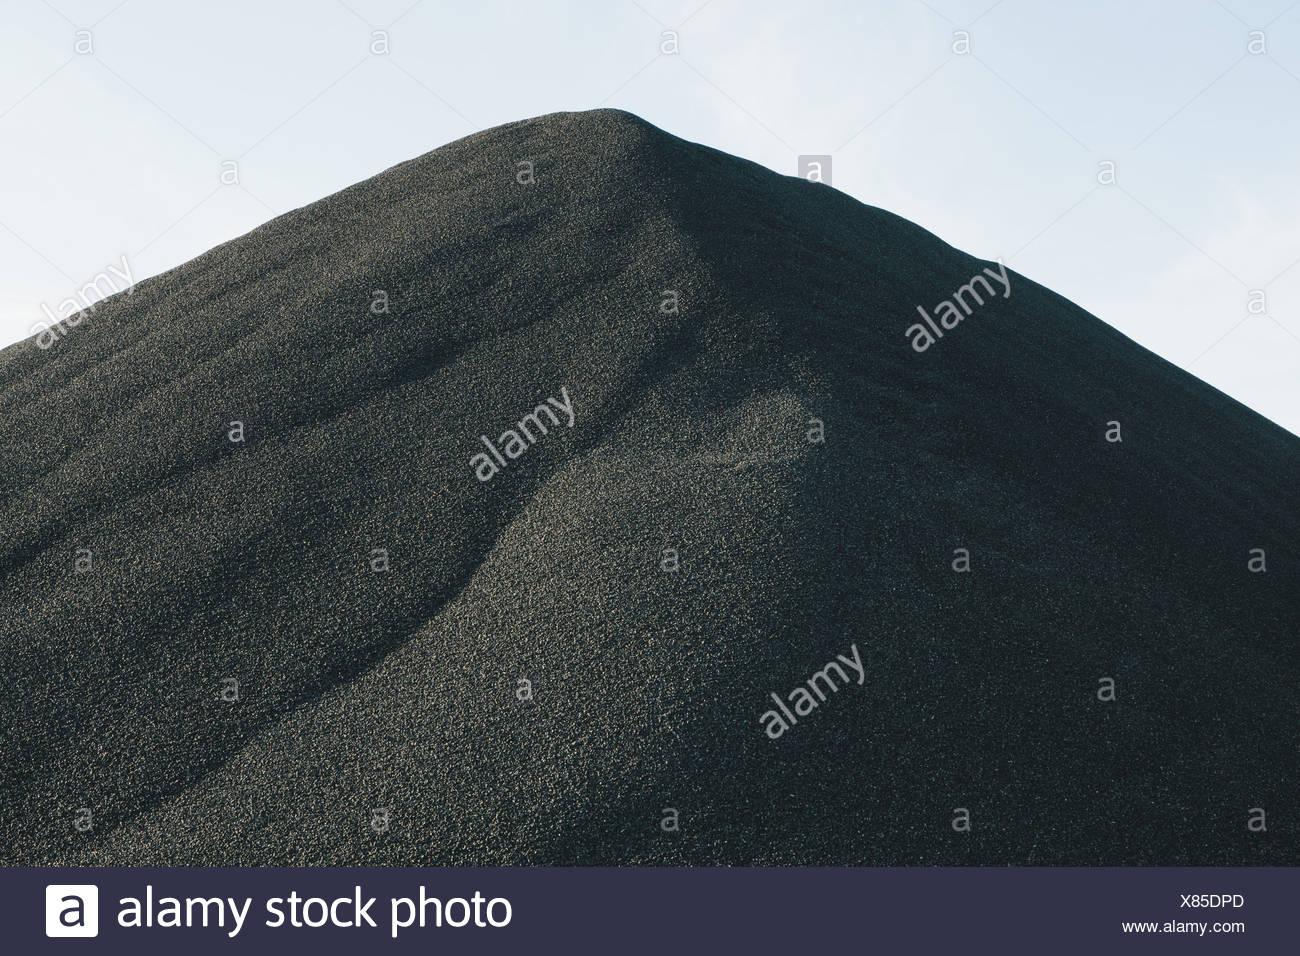 Seattle Washington USA Black coloured gravel pile at quarry Seattle - Stock Image